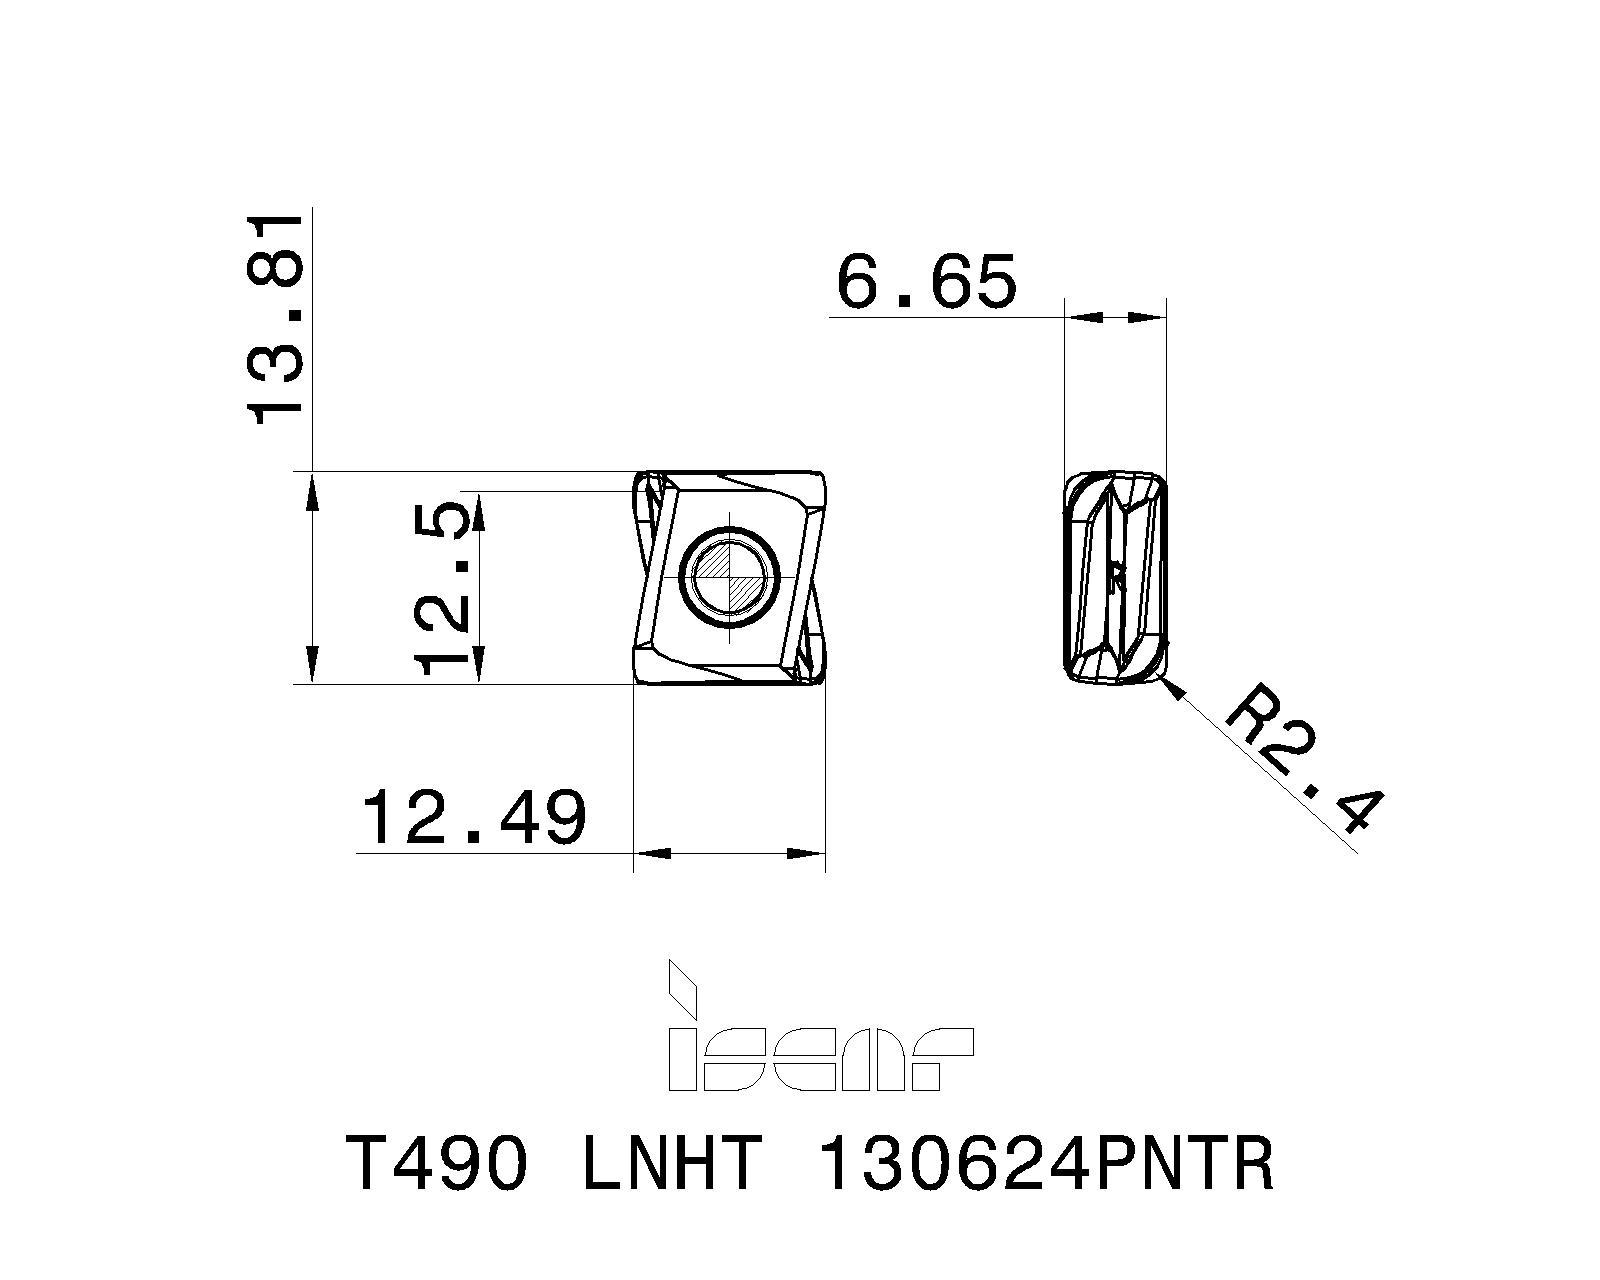 T490 LNHT 130624PNTR IC810 ISCAR INSERT